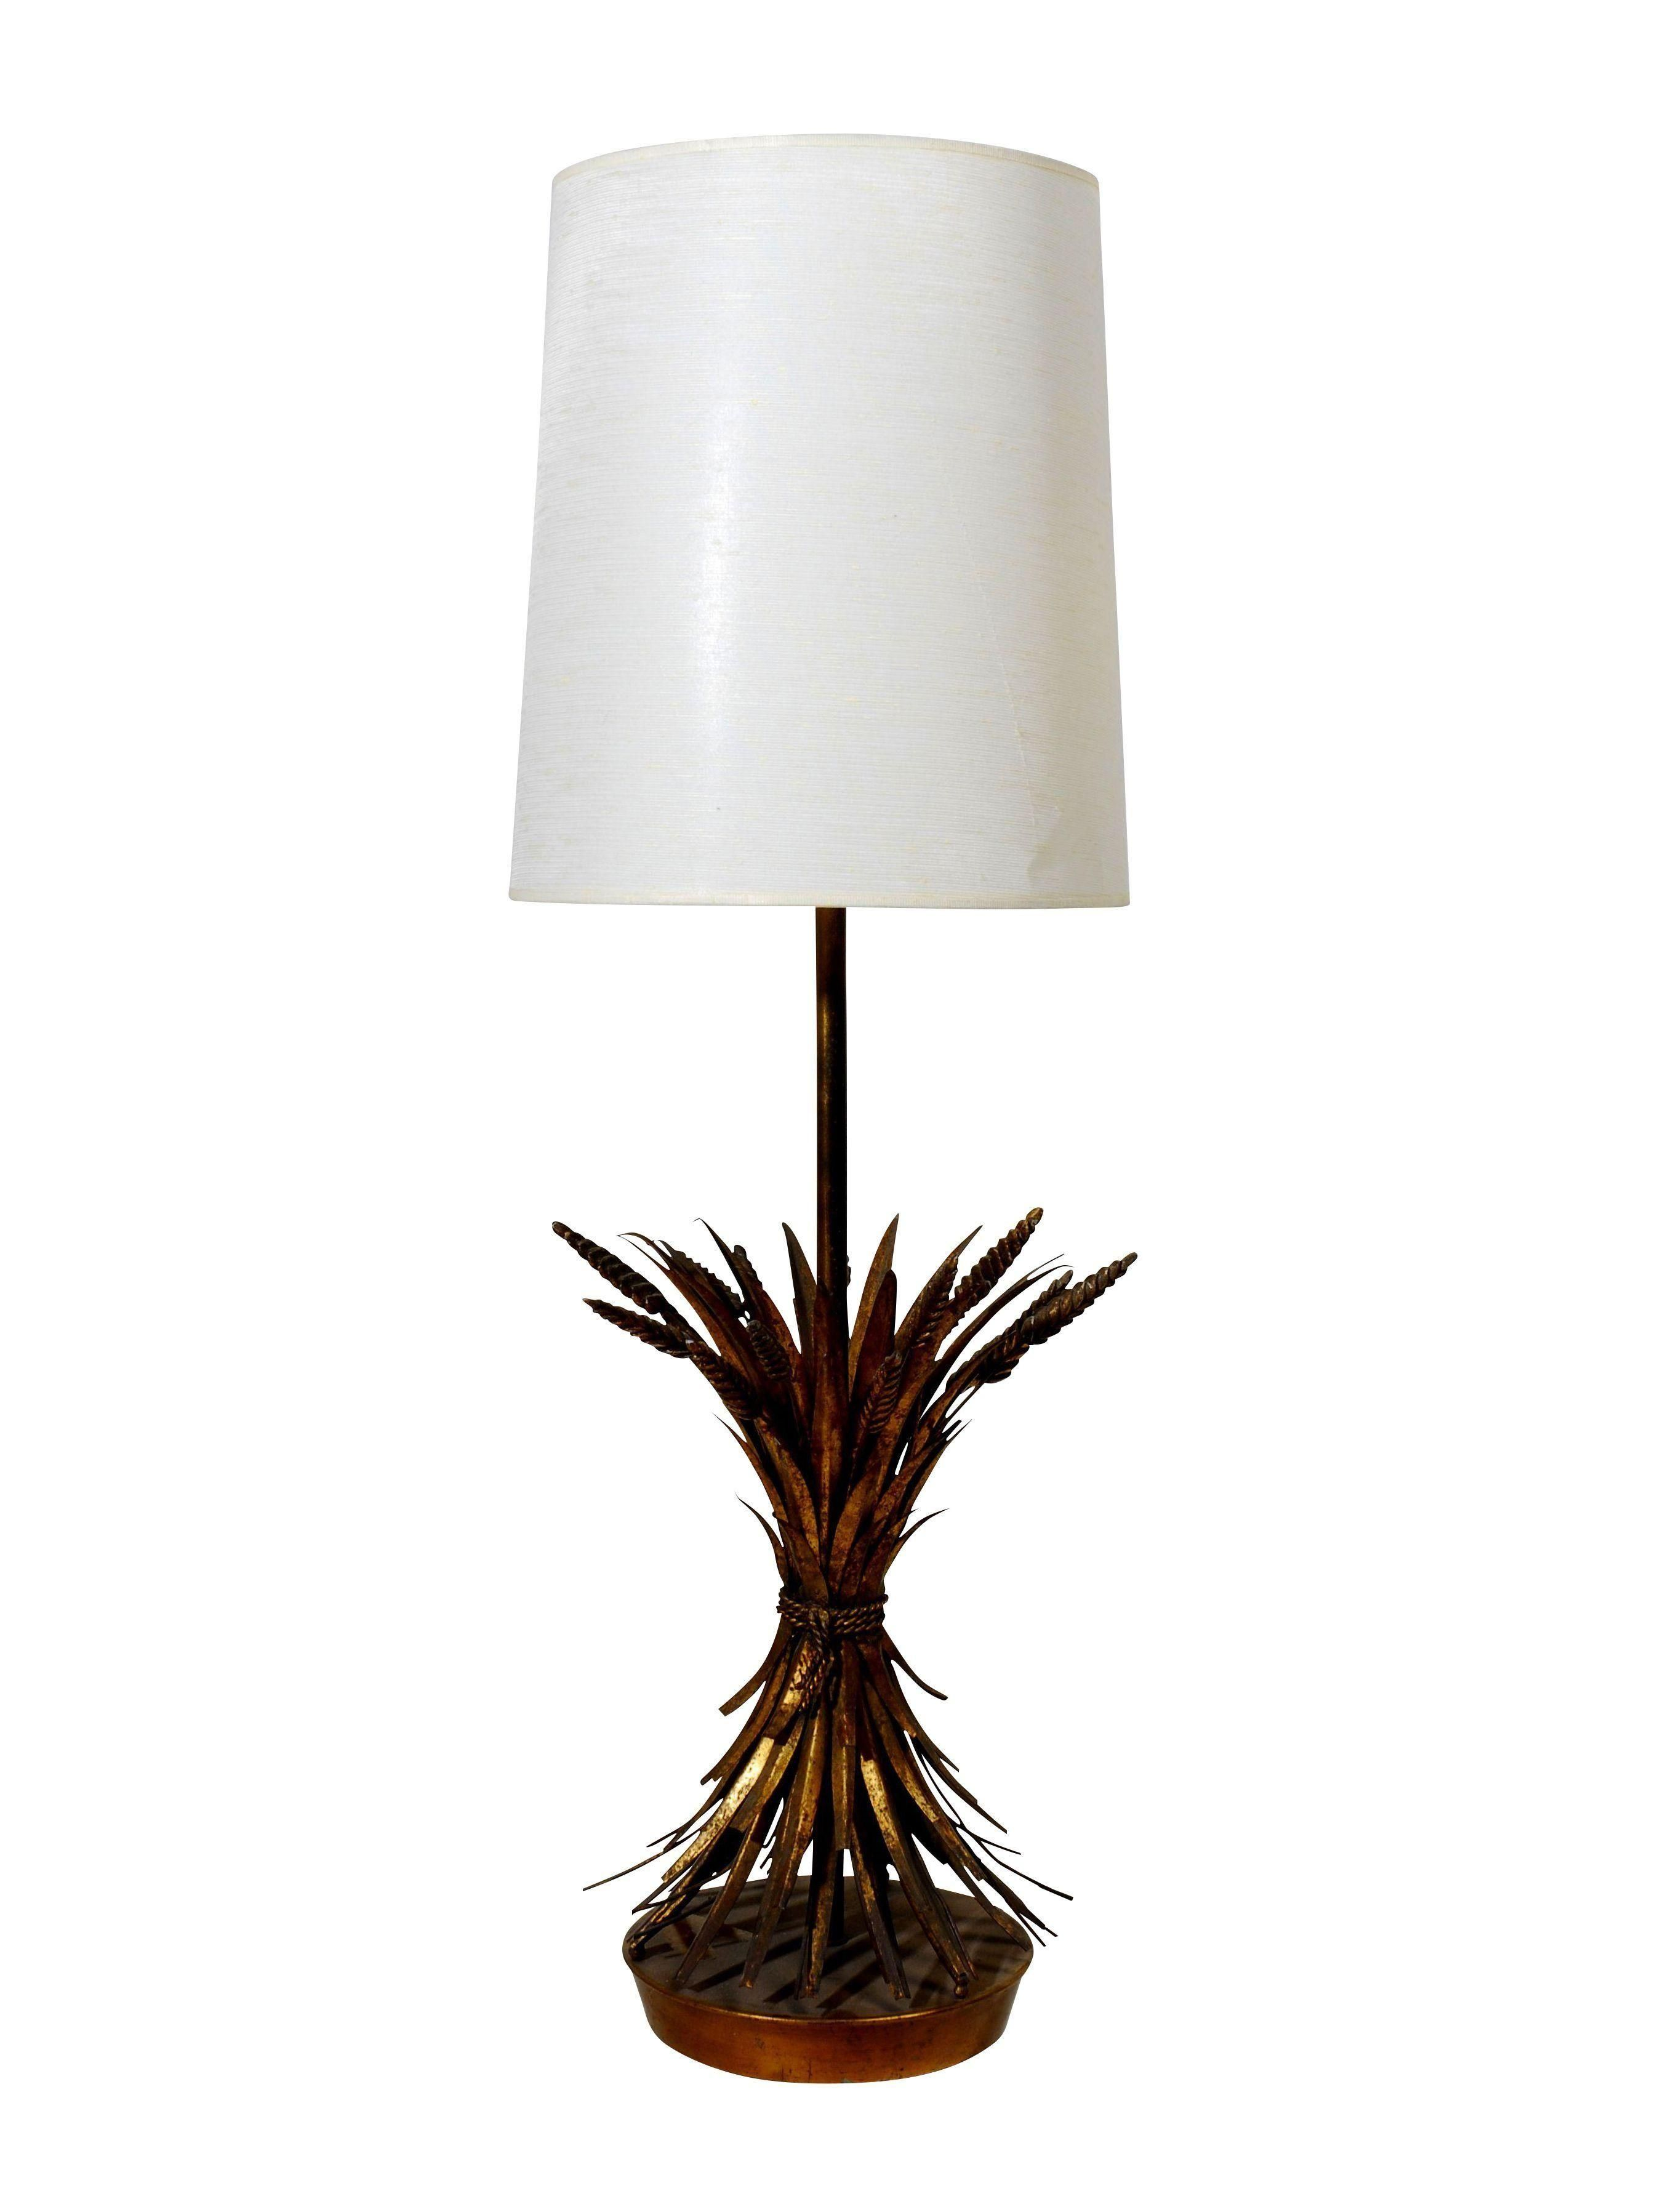 Gold Gilt Marbro Sheaf Of Wheat Lamp Lamp Lamp Light Table Lamp